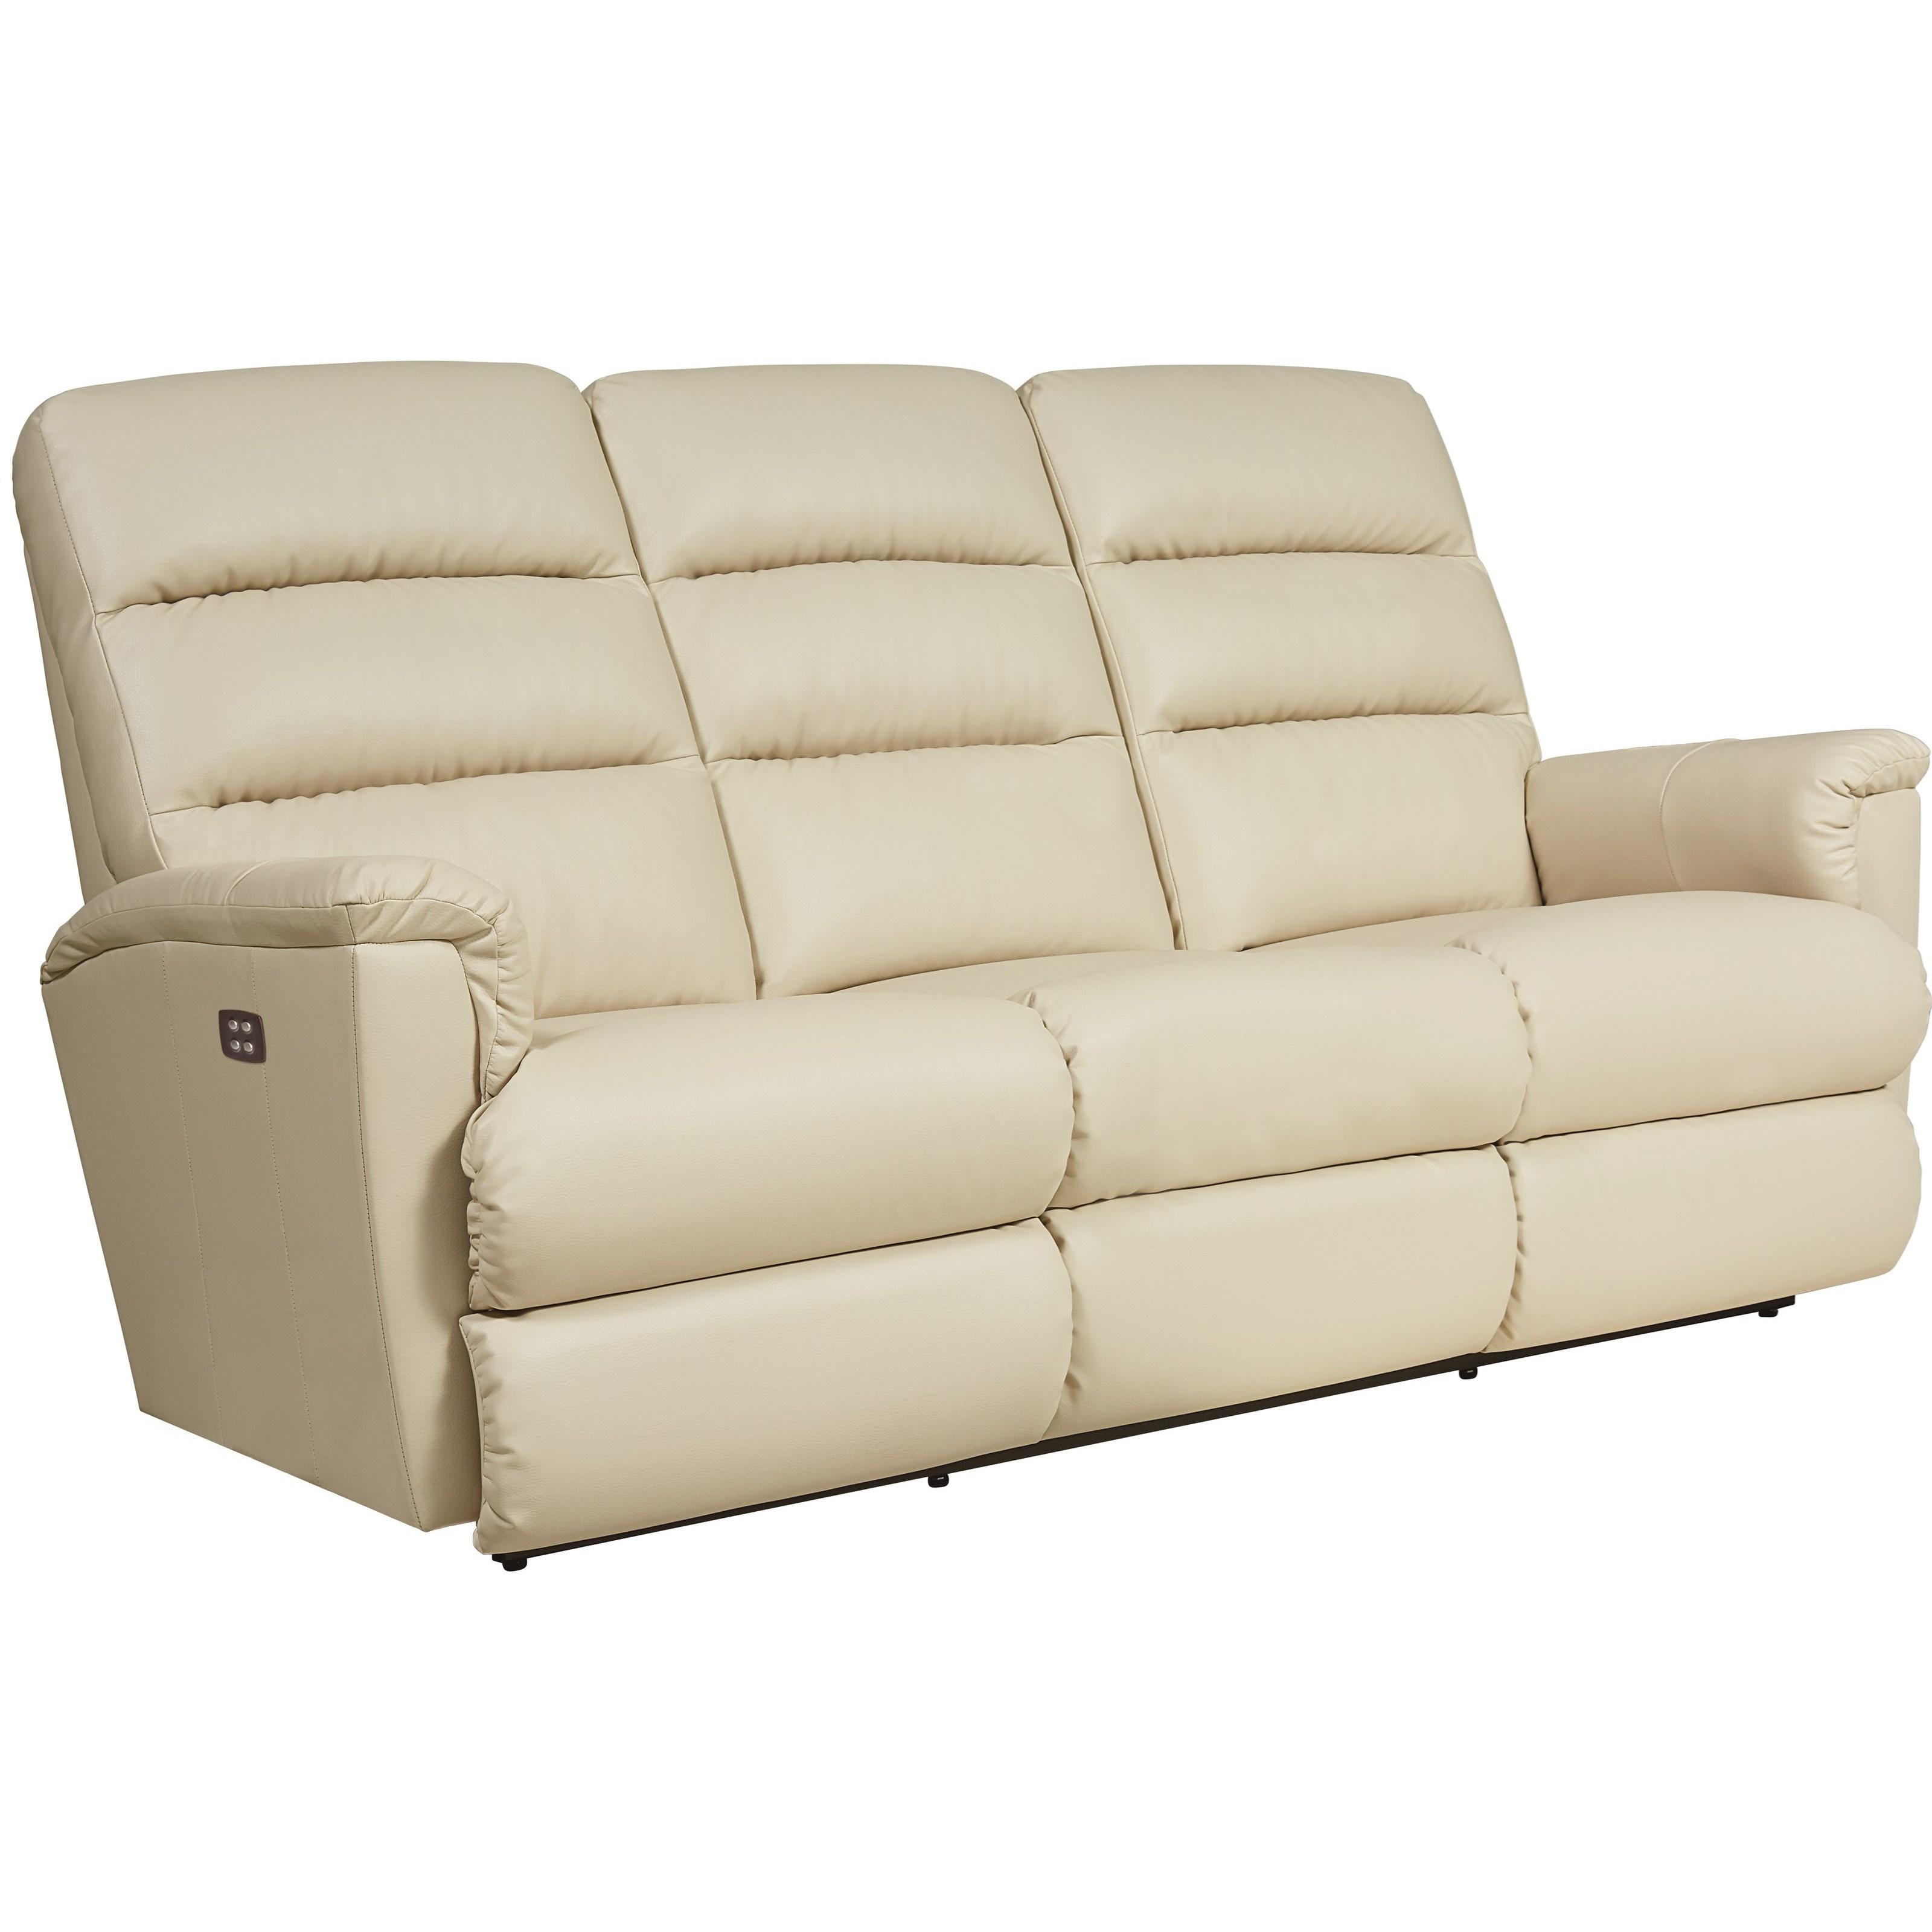 La Z Boy TripoliPower Recline XRw™ Full Reclining Sofa